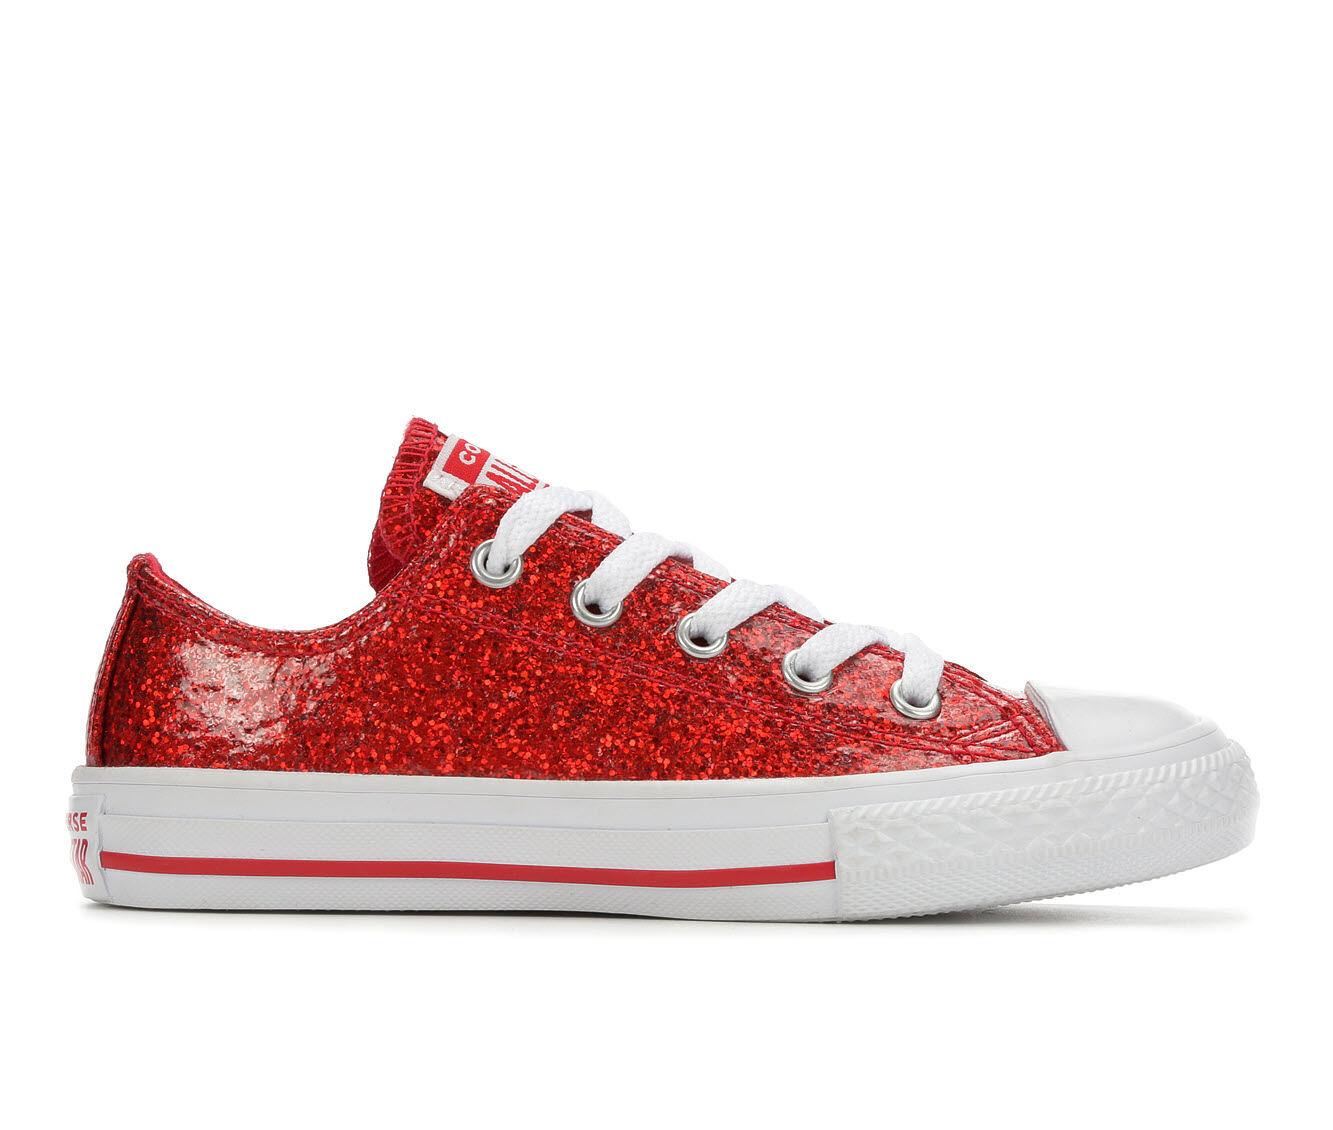 premium selection 92b54 43d51 pink purple girls youth jordan shoes D f3nde comprar zapatillas nike air max  ...